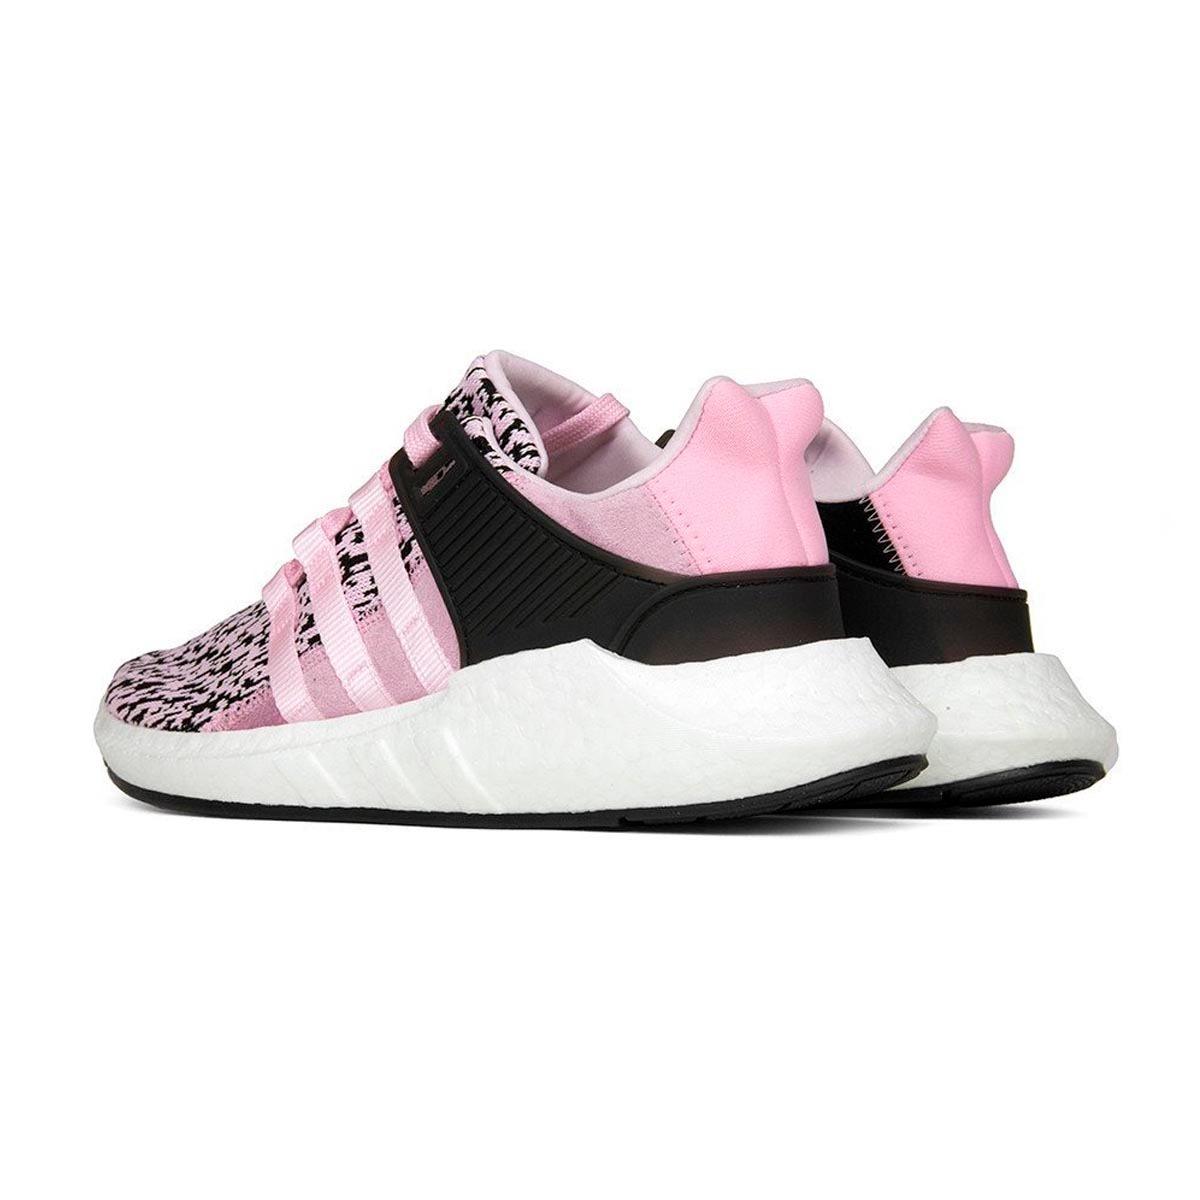 ad4cfcff8 tênis adidas eqt support 93 17 wonder pink. Carregando zoom.